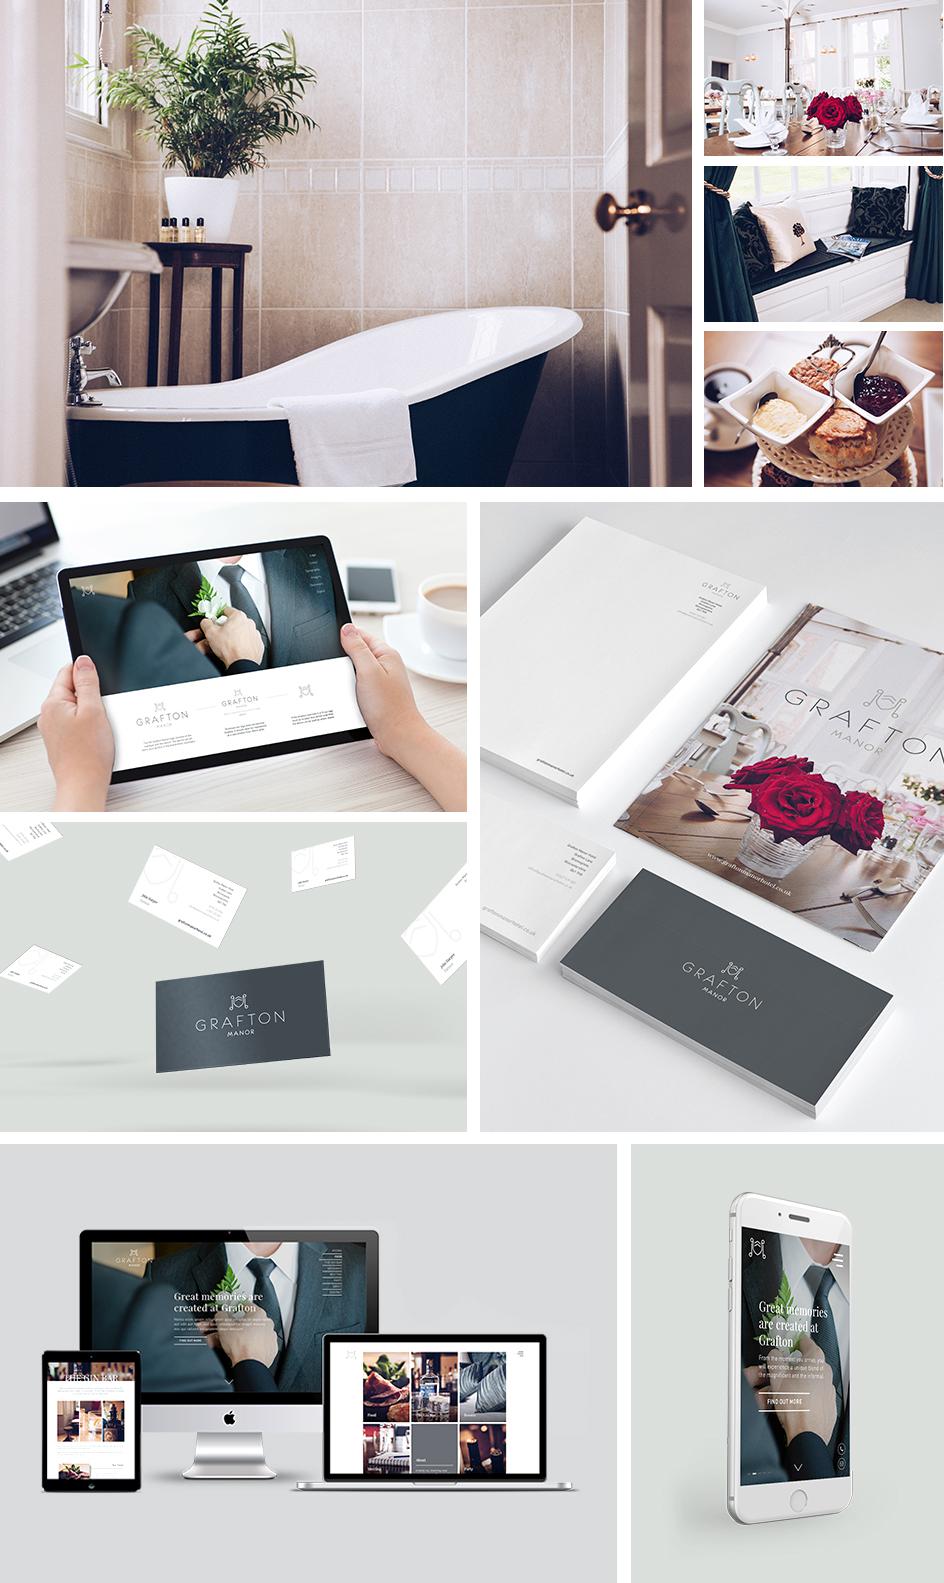 Silver---Portfolio---Grafton---Main